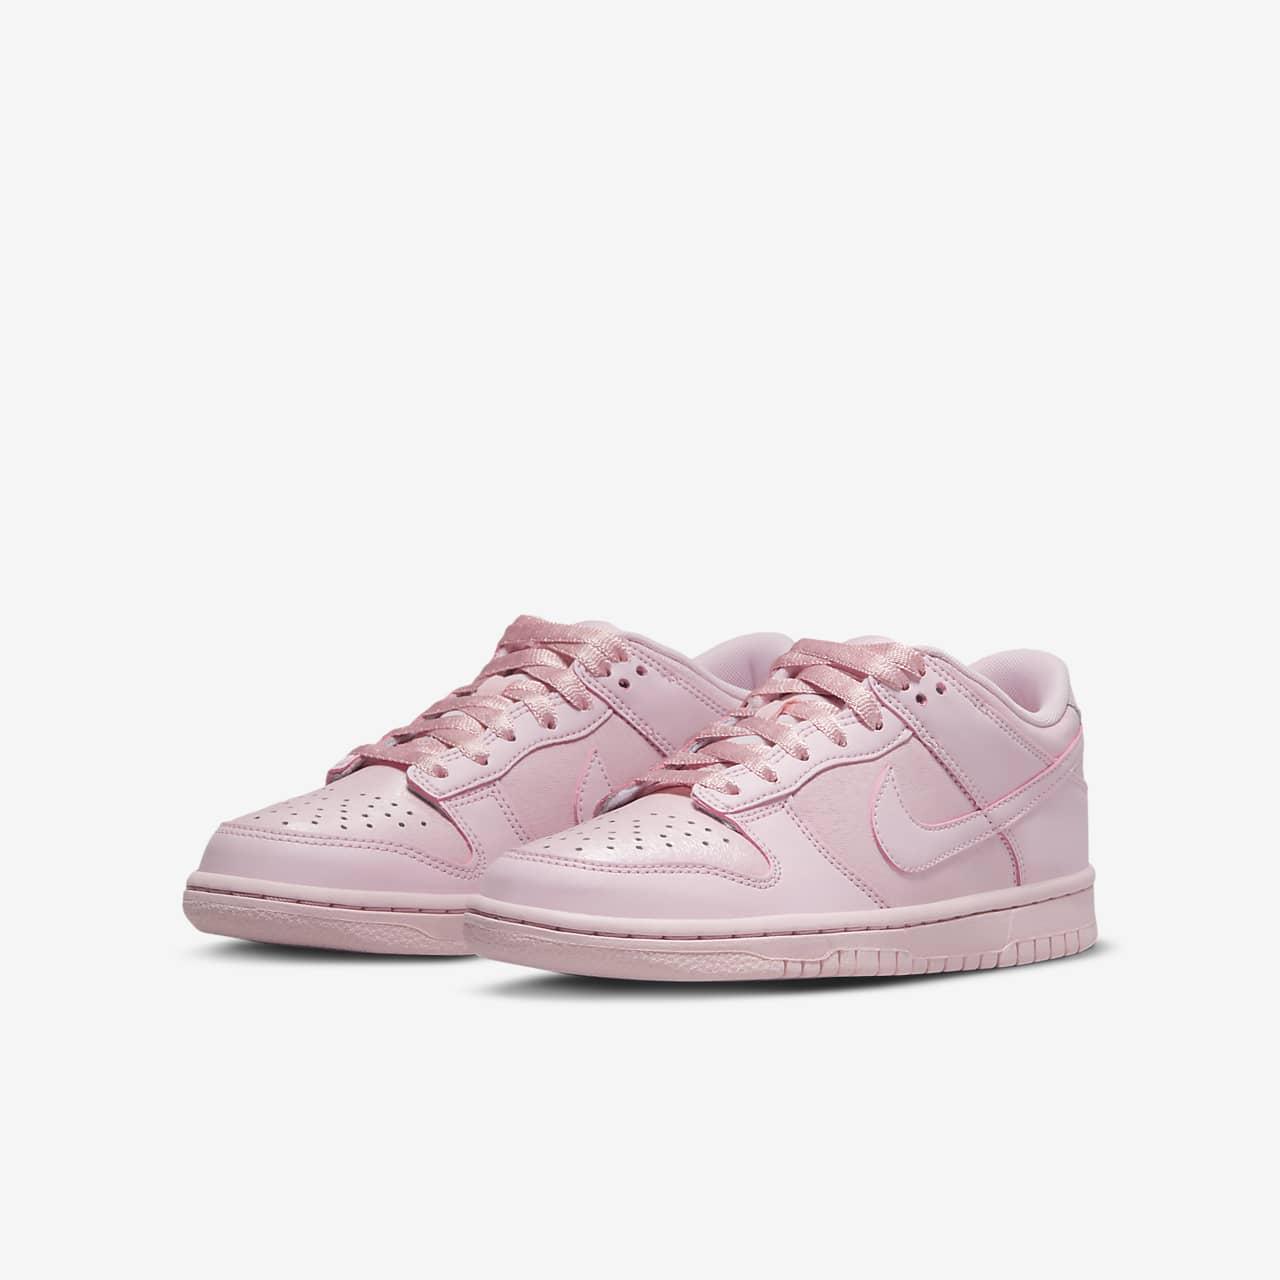 ... Nike Dunk Low SE Older Kids' Shoe